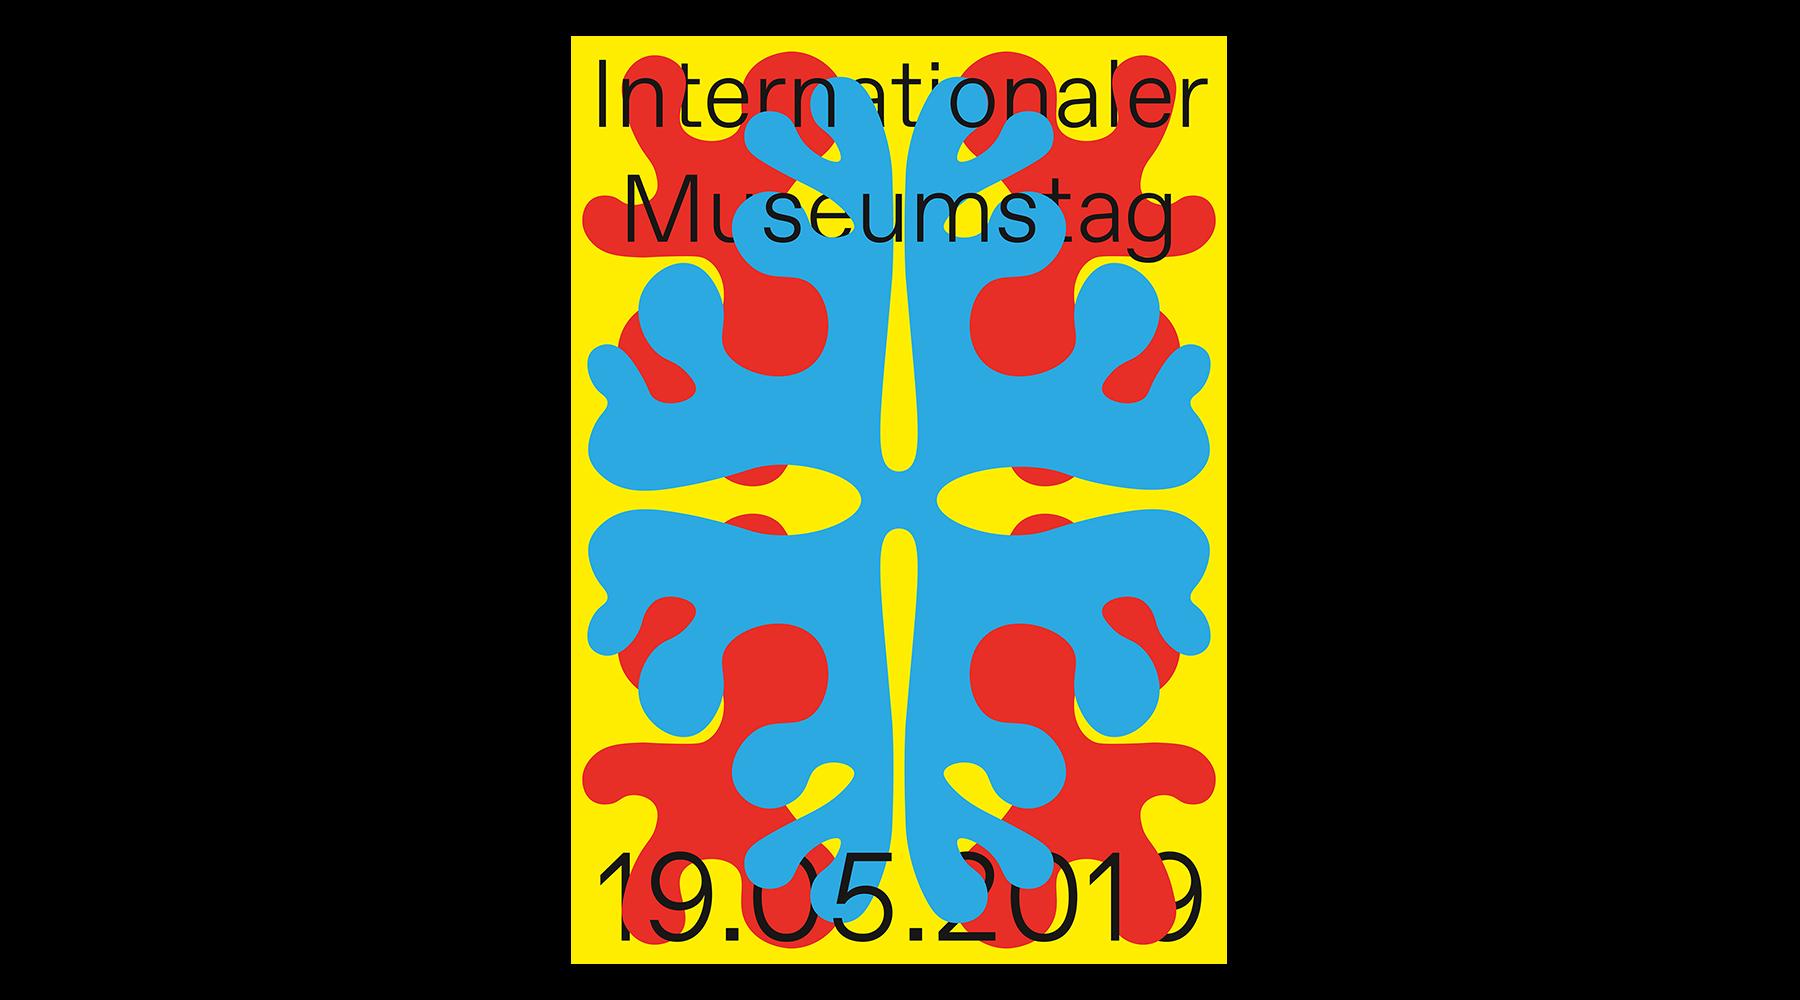 IMT_Web_01